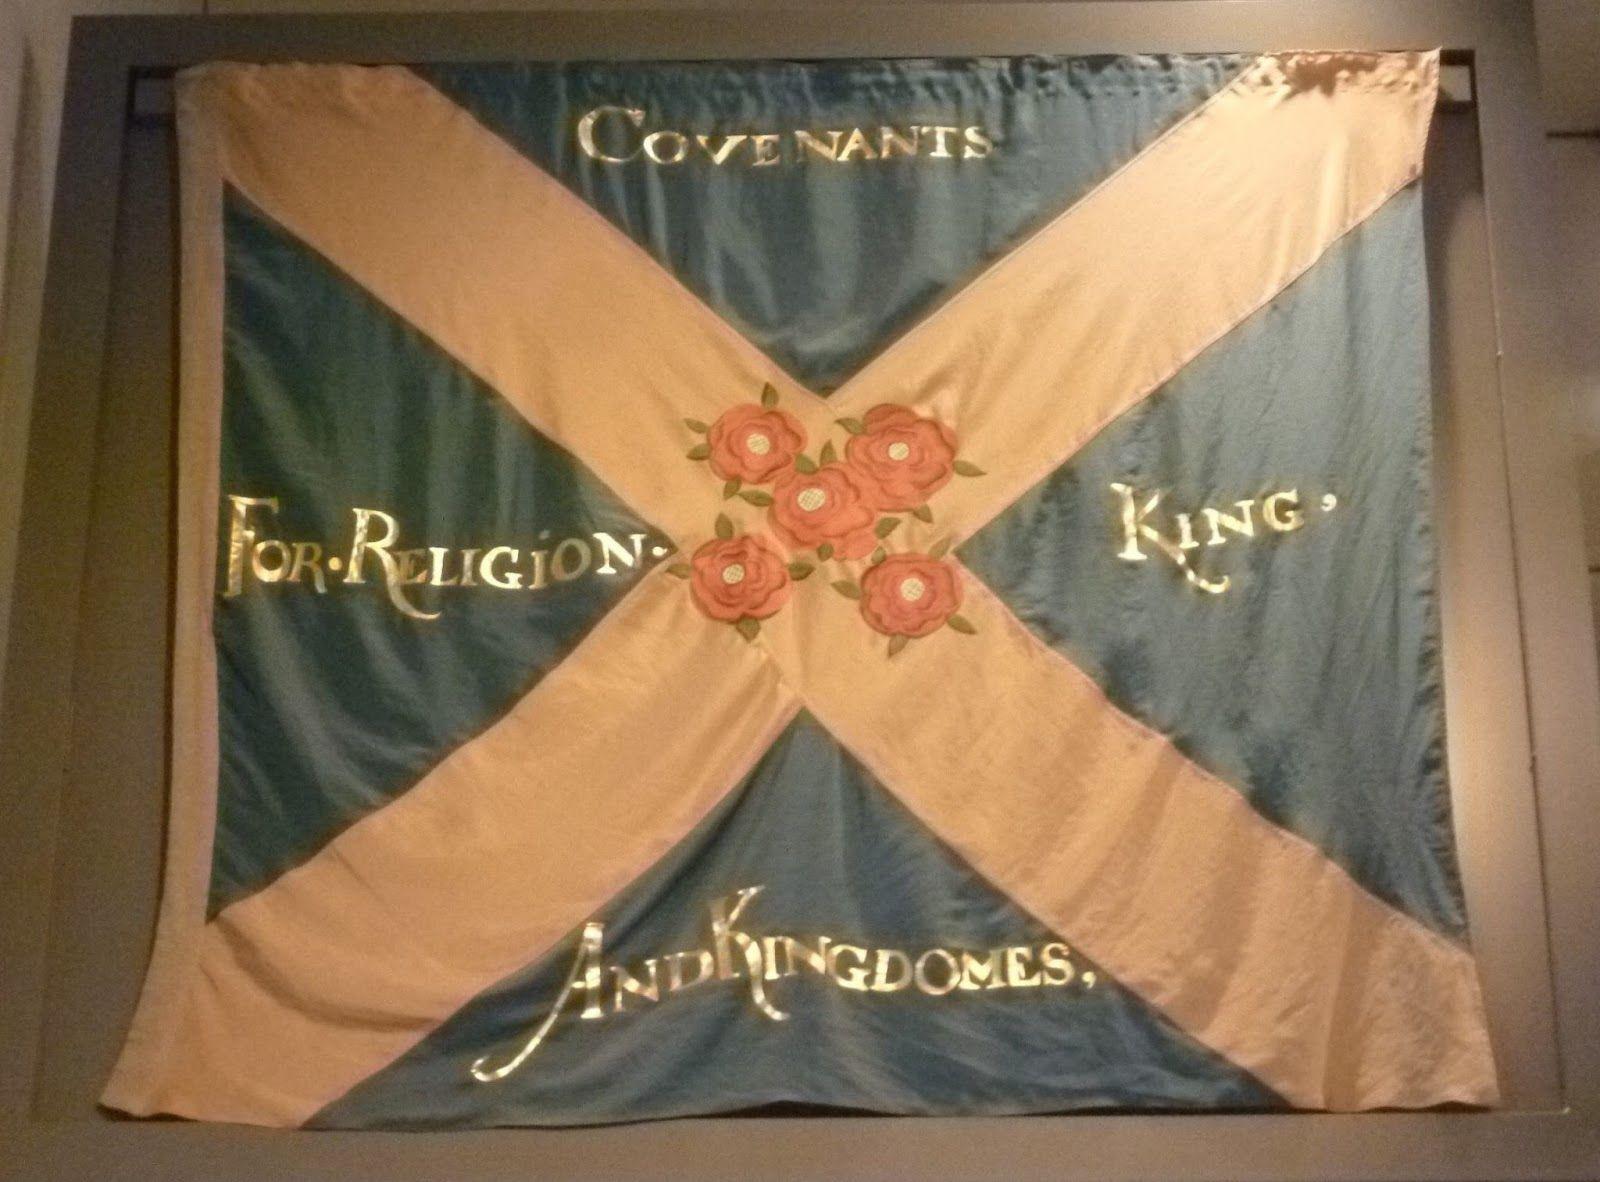 defending the legacy jacobite flag edinburgh volunteers